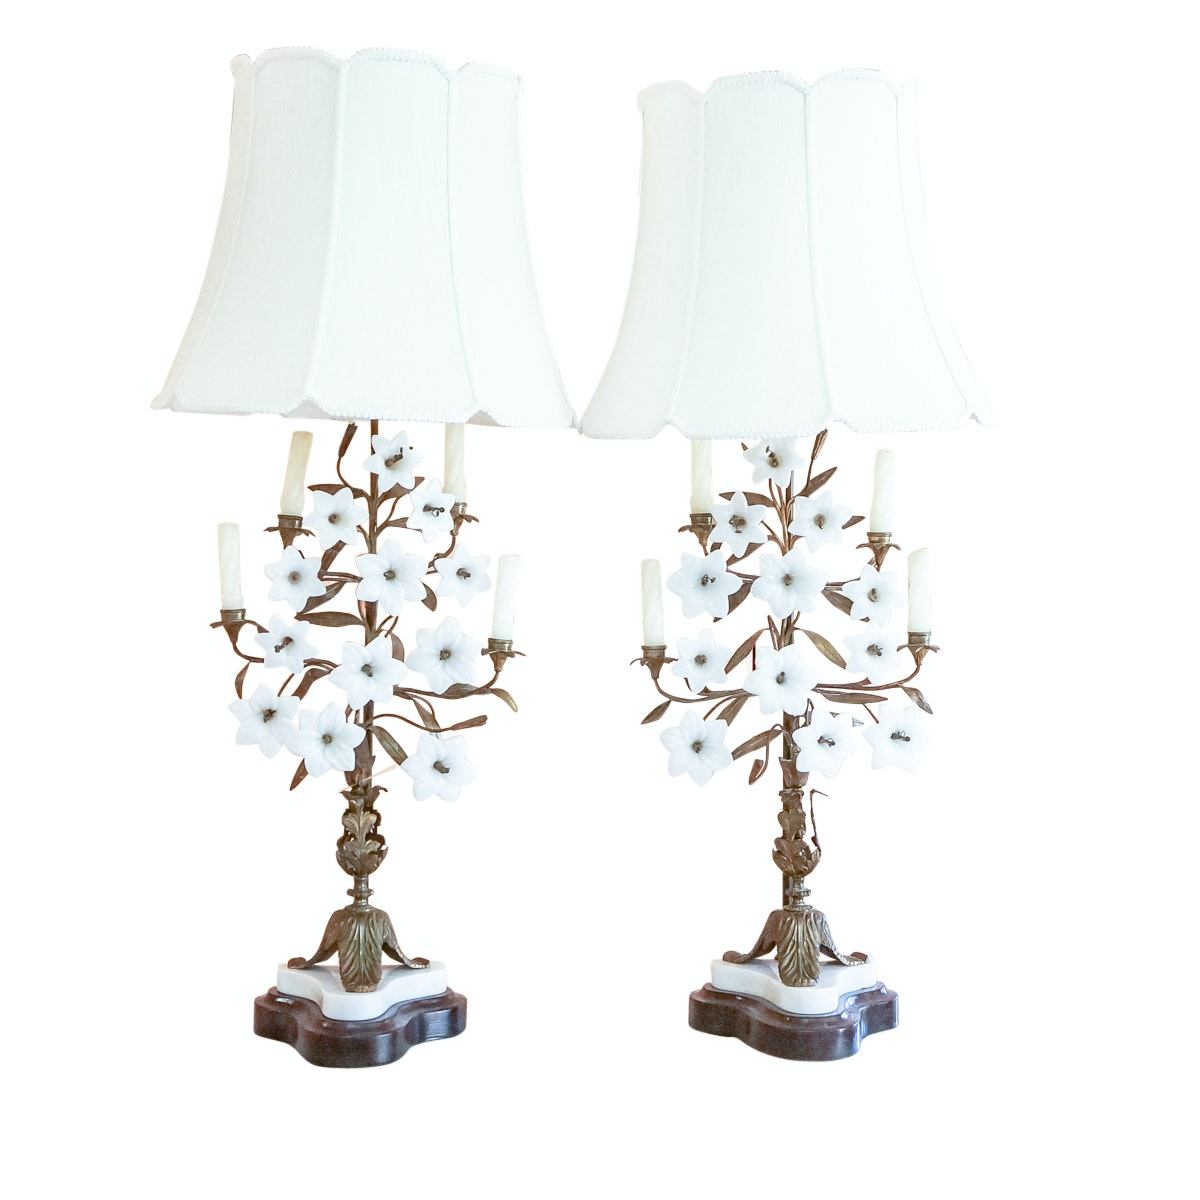 Vintage White Glass Floral Candelabra Table Lamps